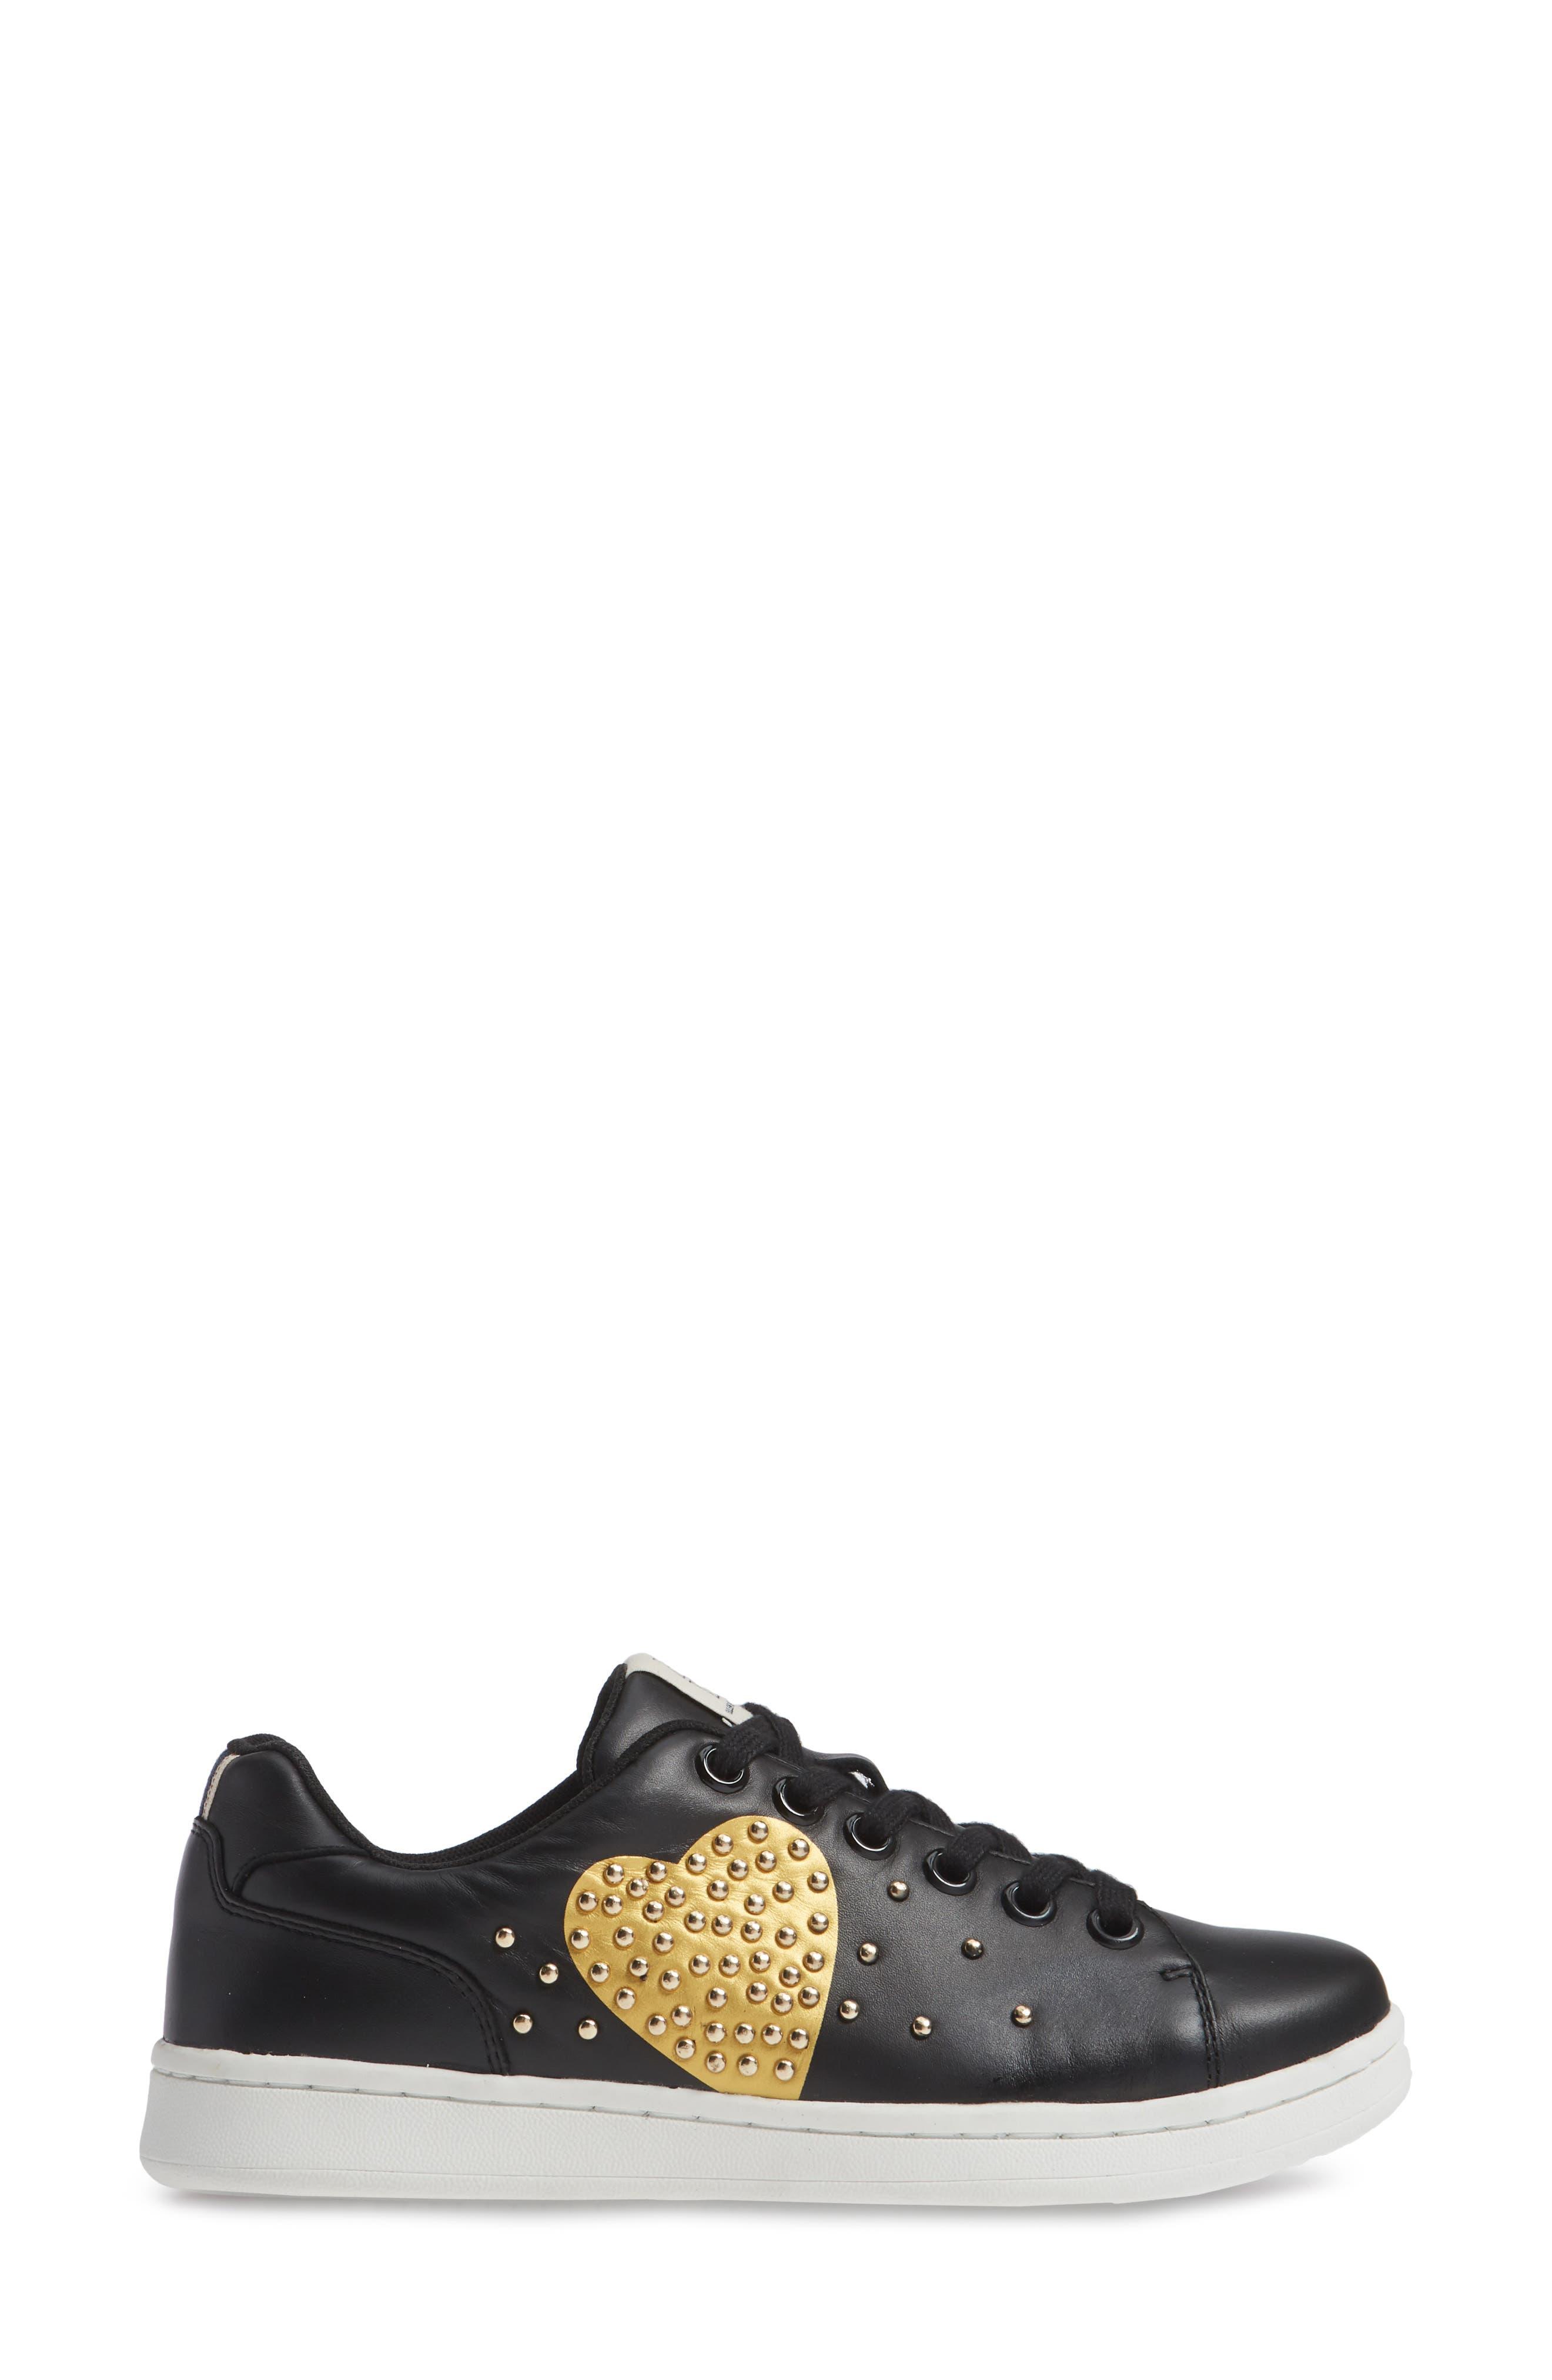 Chamour Sneaker,                             Alternate thumbnail 3, color,                             BLACK/ GOLD LEATHER